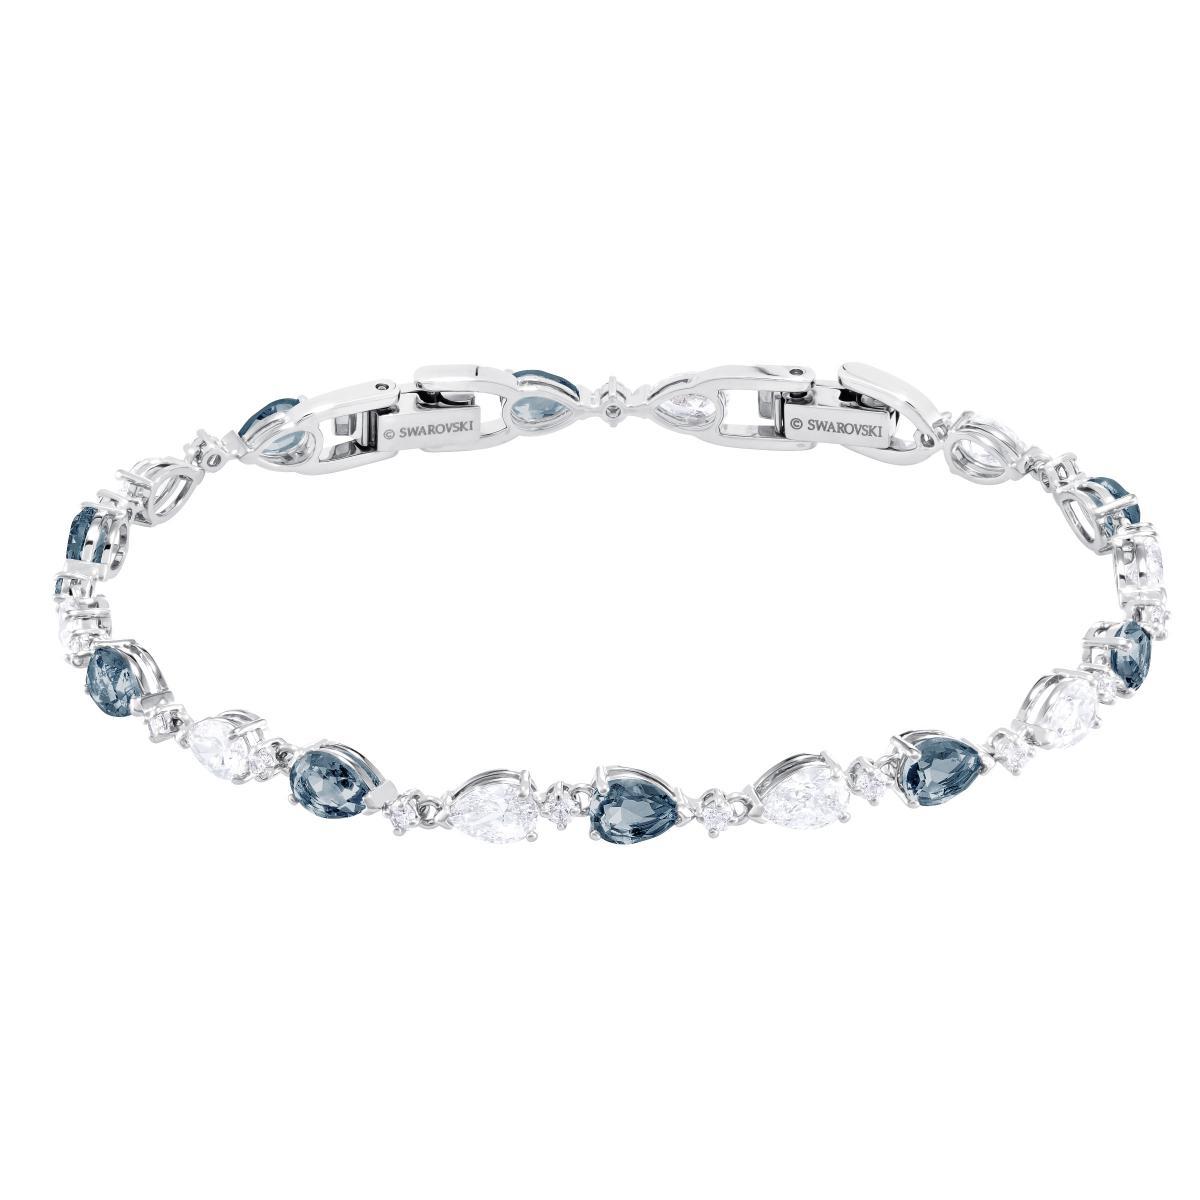 Bracelet Swarovski 5466882 - Bracelet Timeless Elegance Argenté Bleu Femme